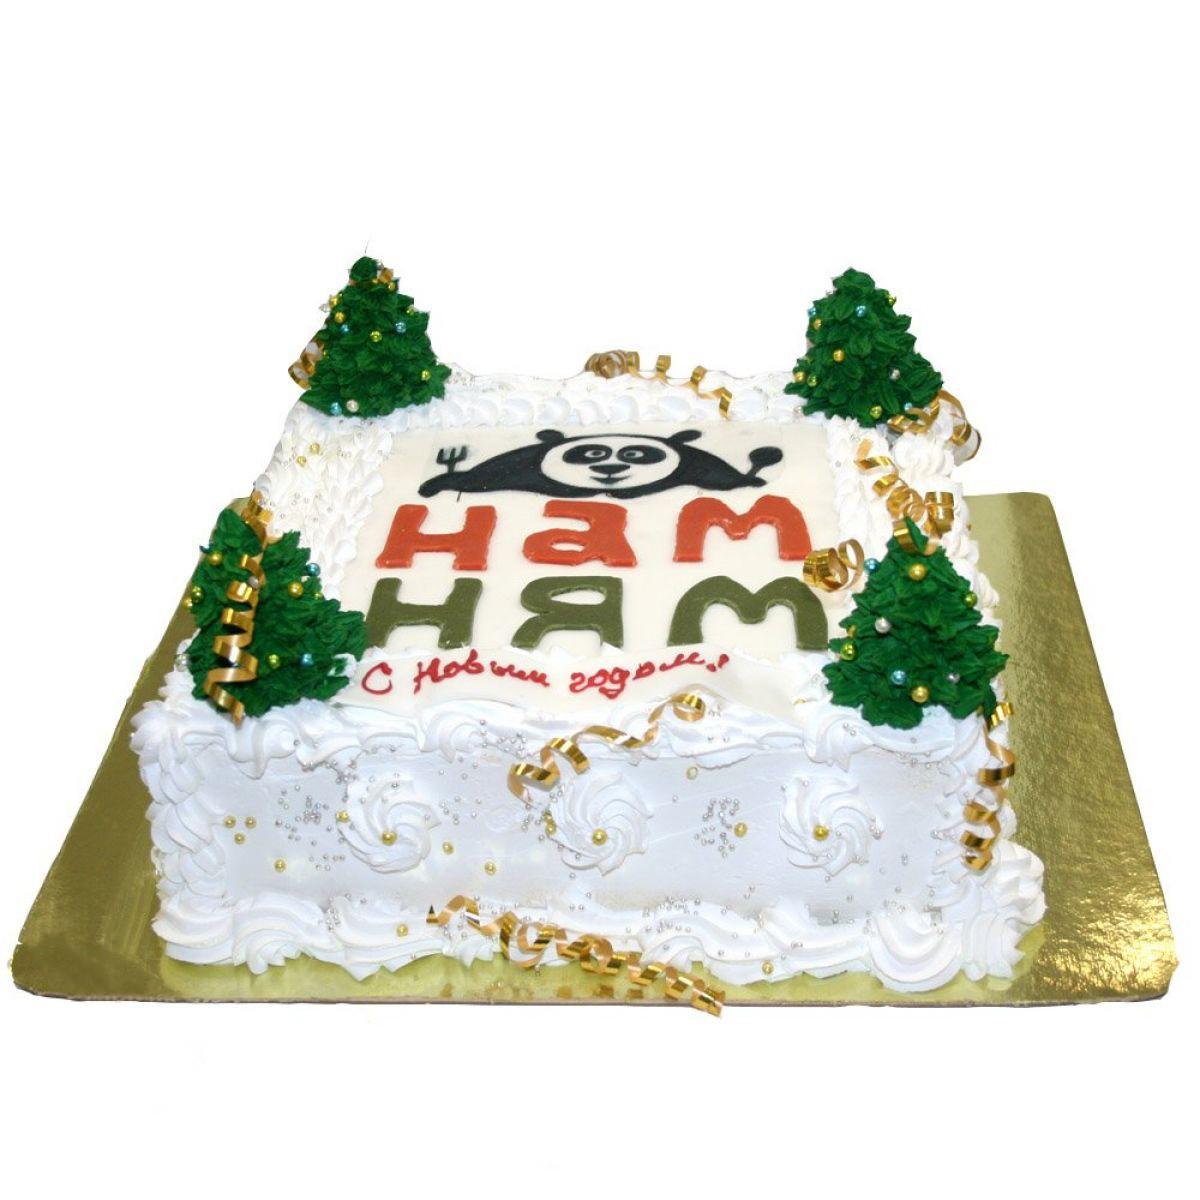 №996 Торт еда